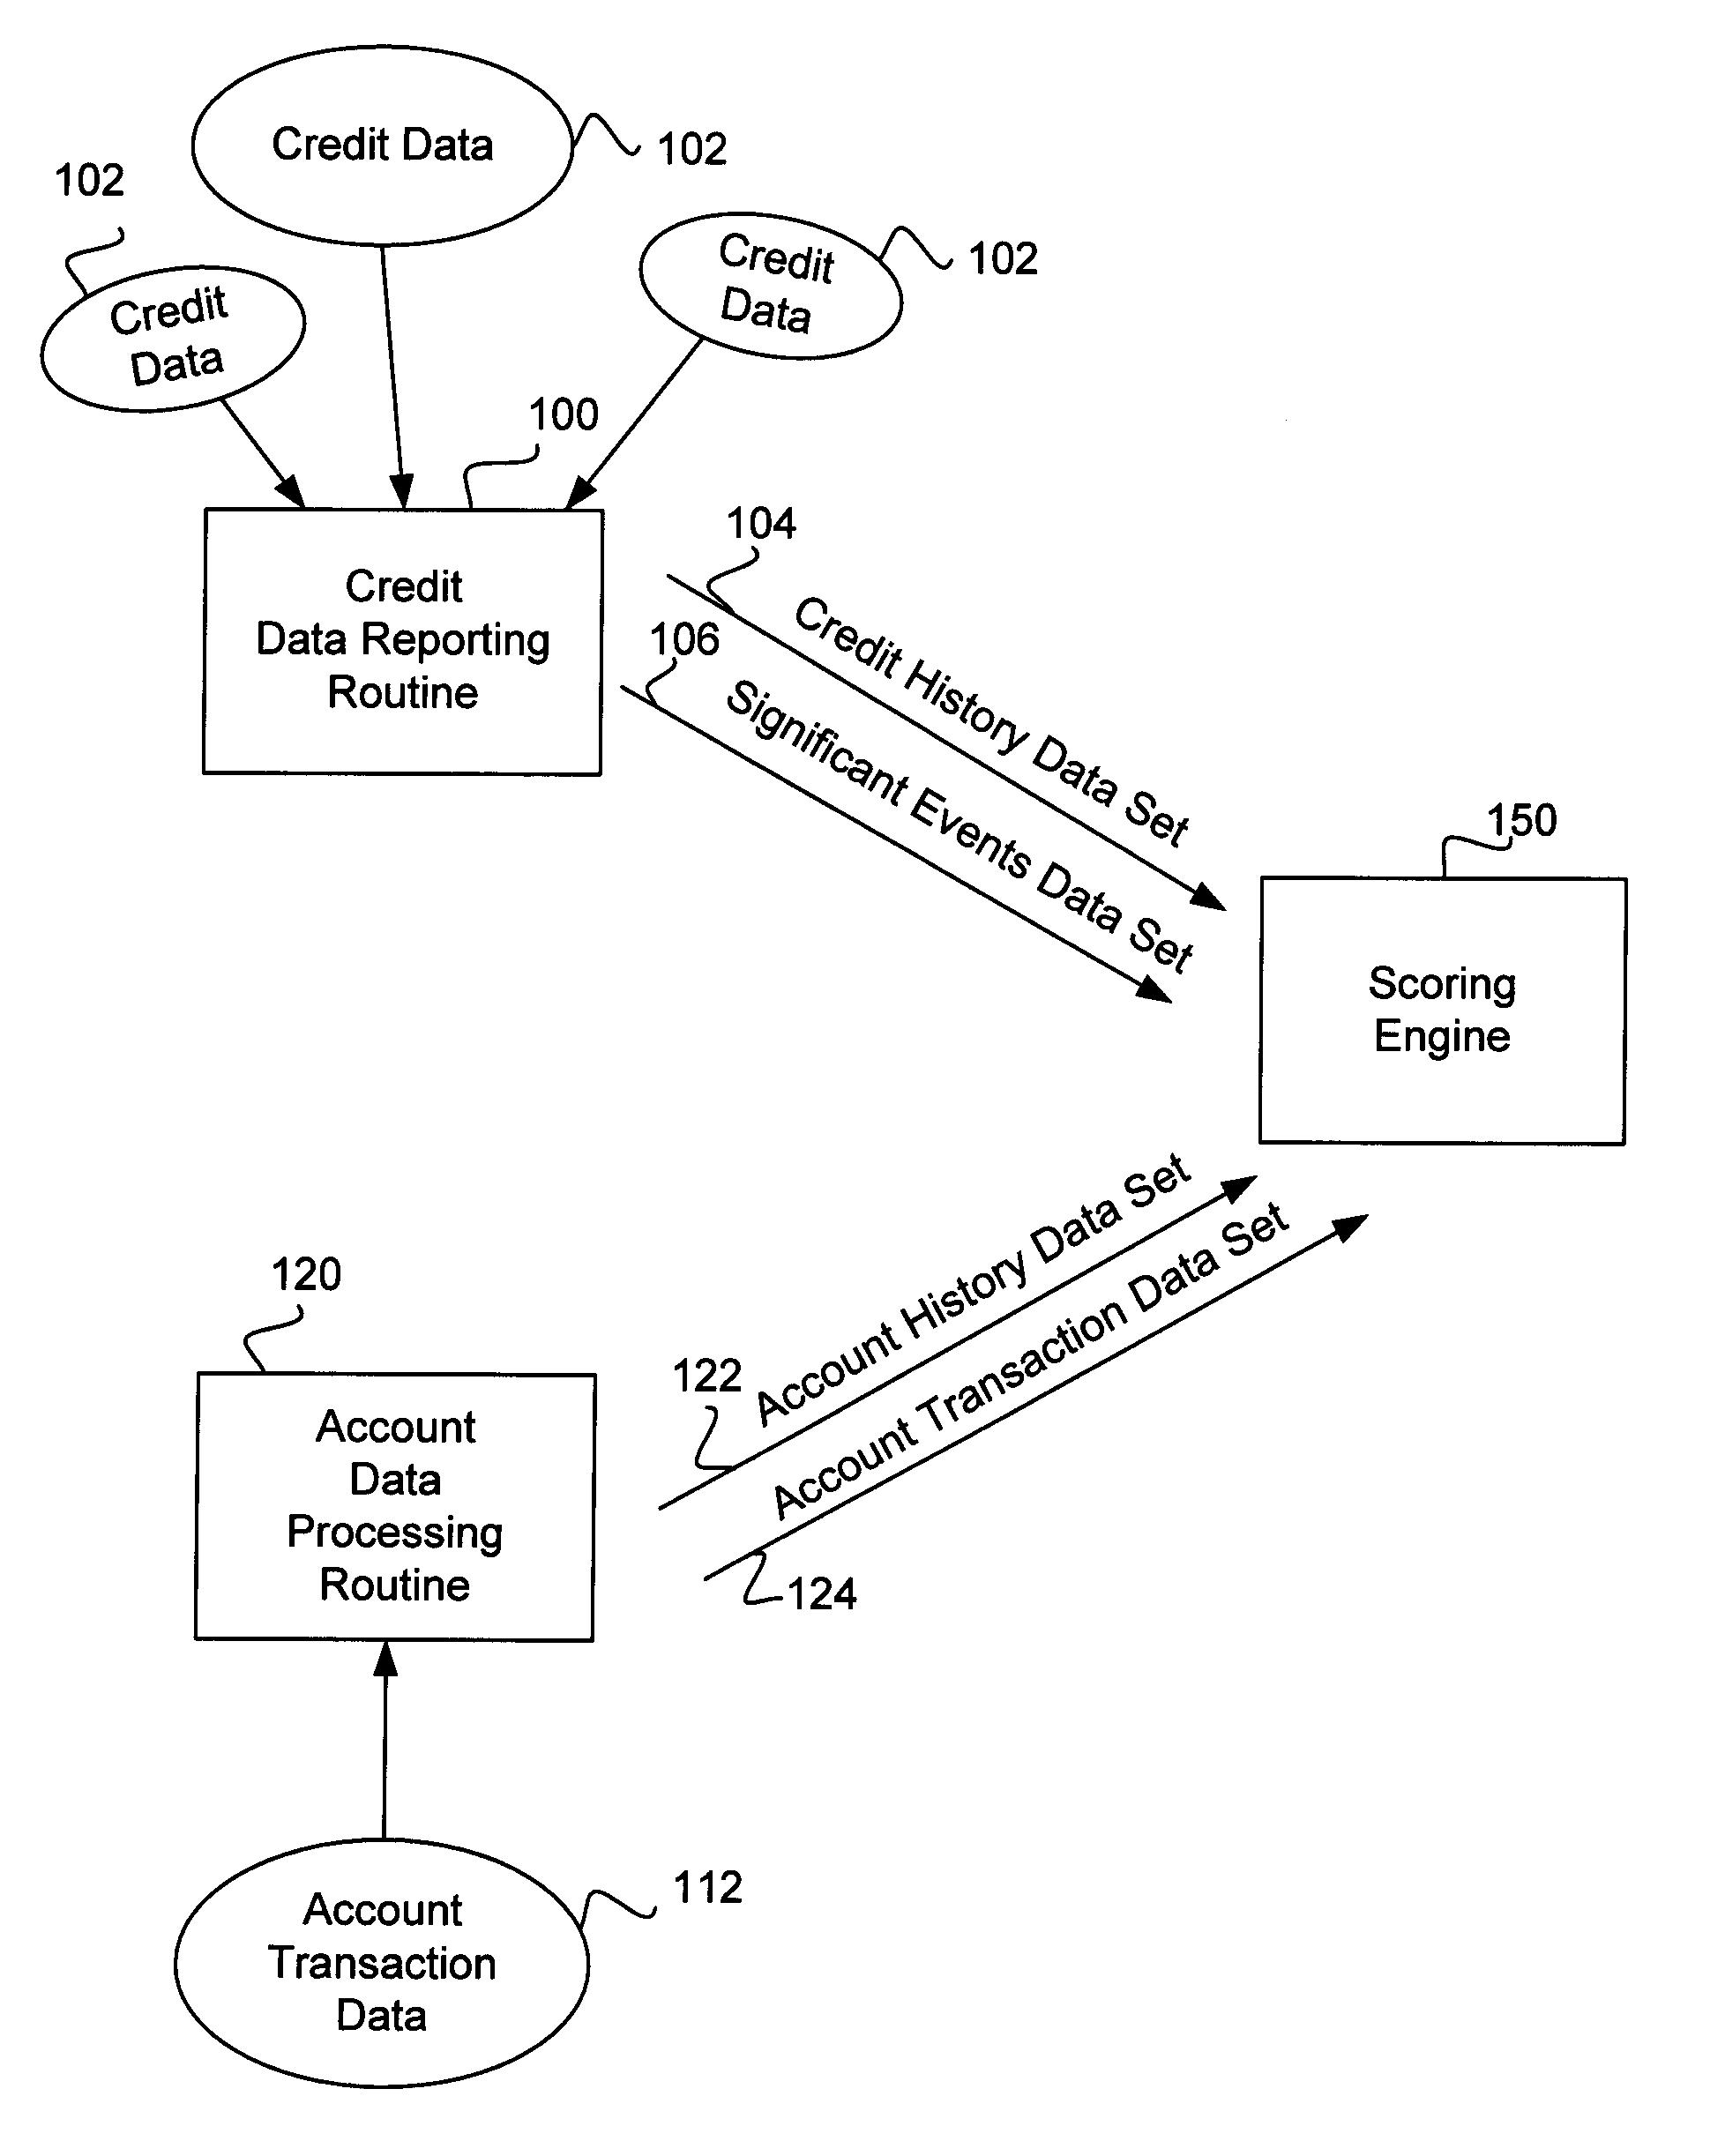 Patent US 8,160,960 B1